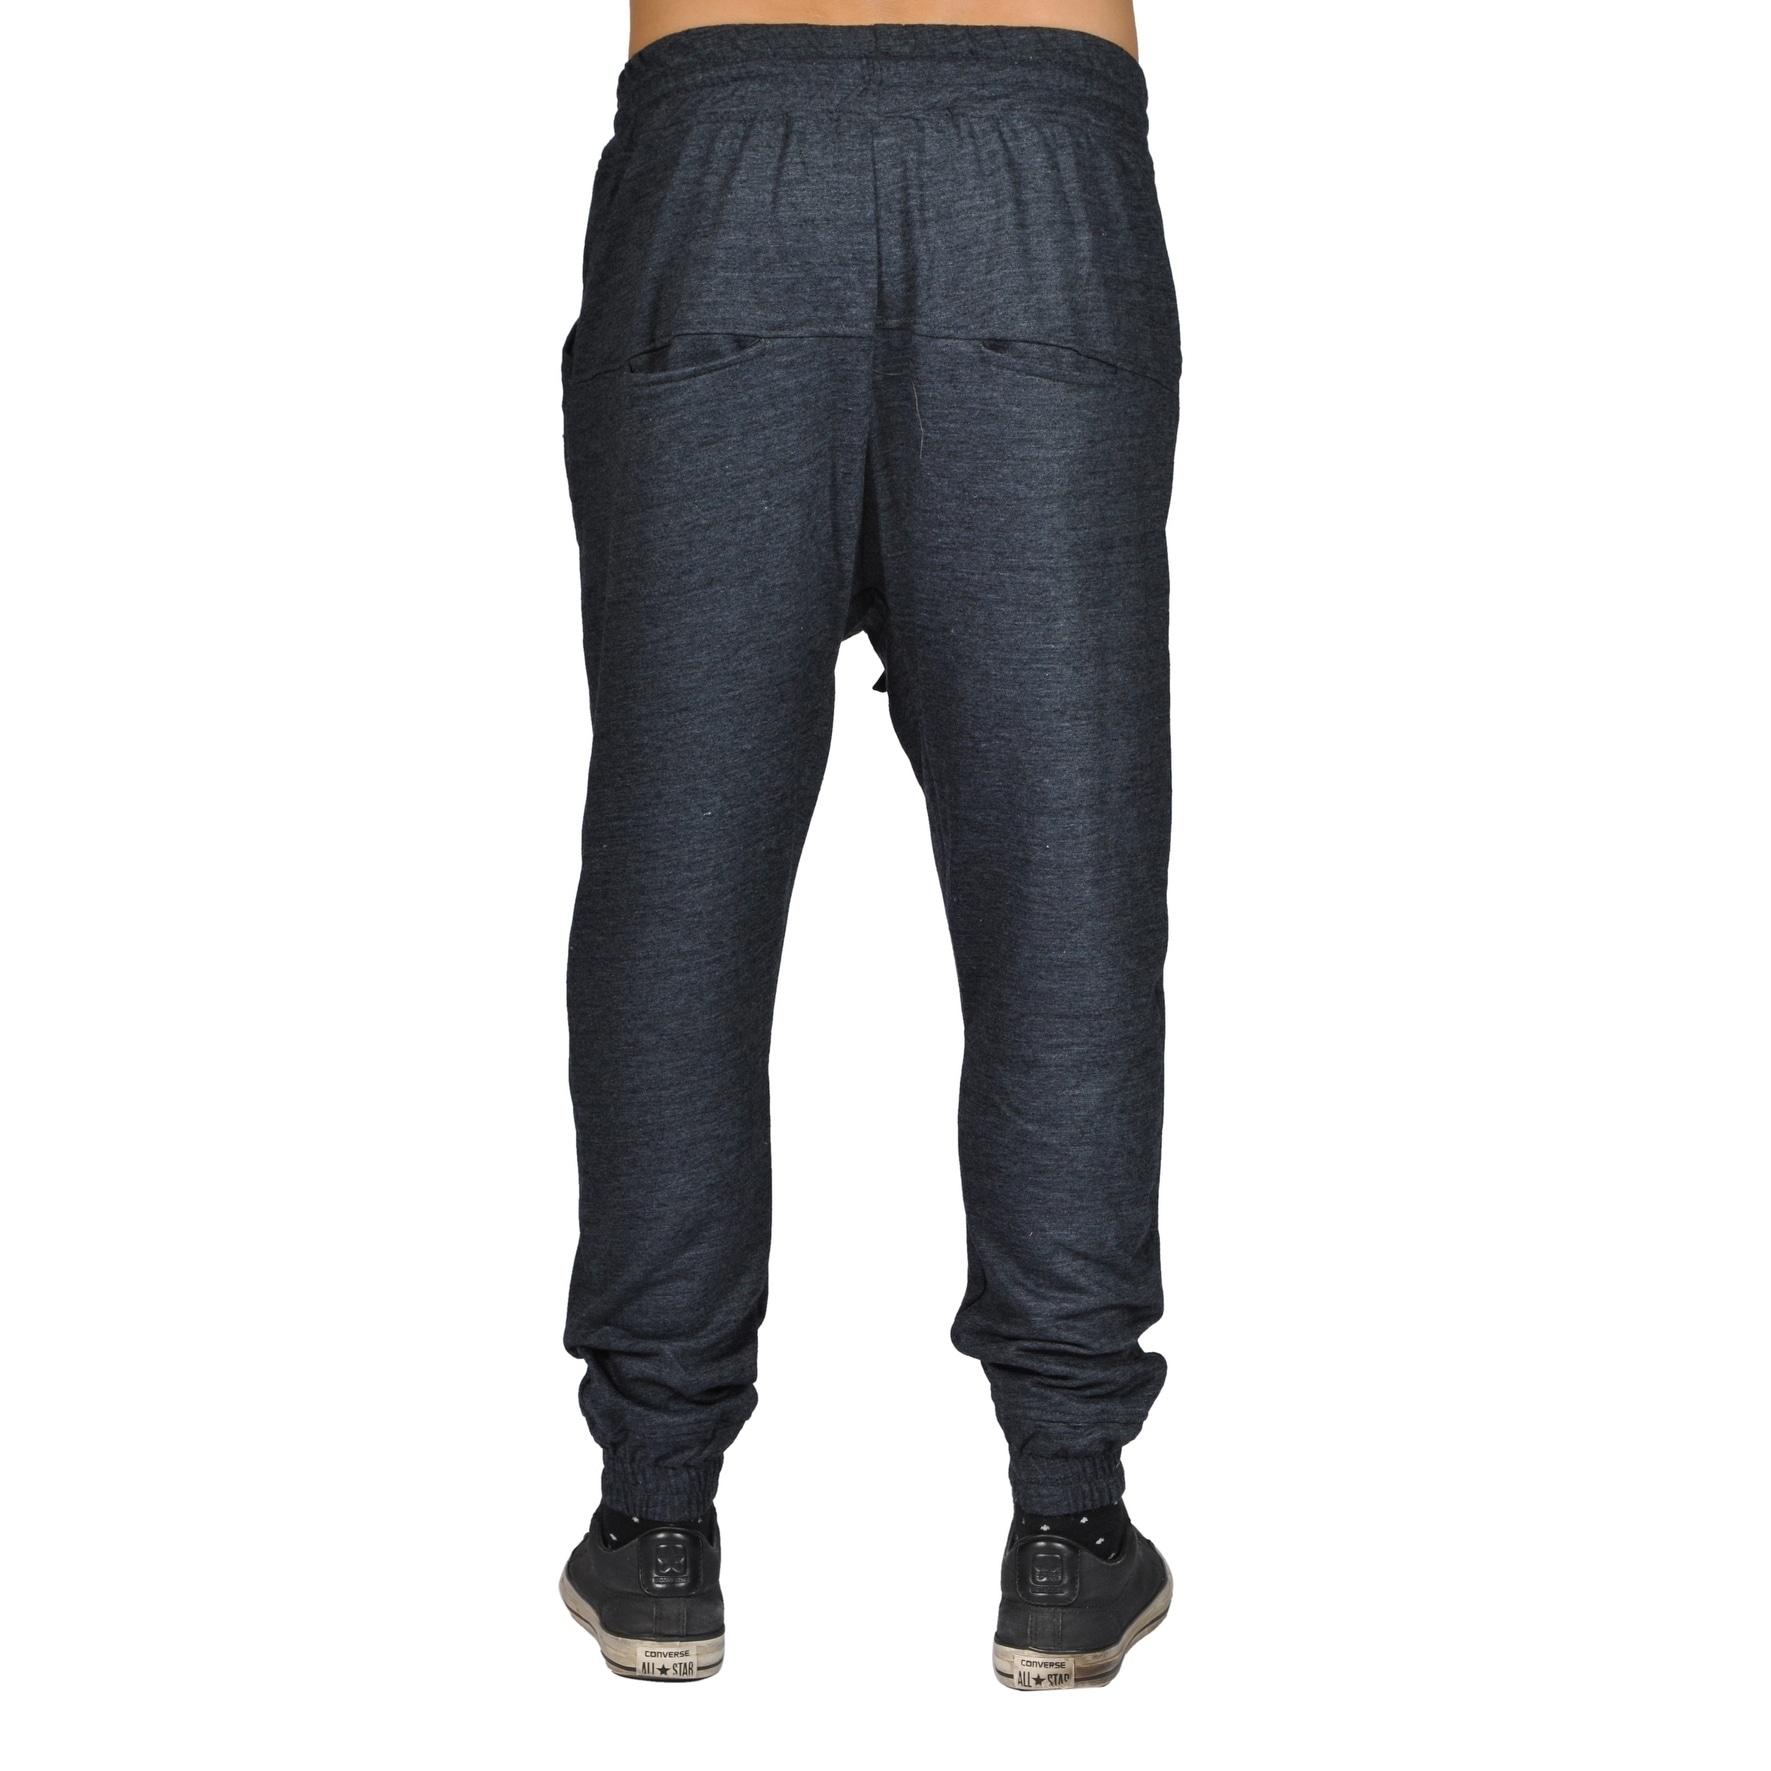 83c9801552c Shop Men s Harem Trousers Hip Hop Nice Drop Joggers Dark Grey - On ...